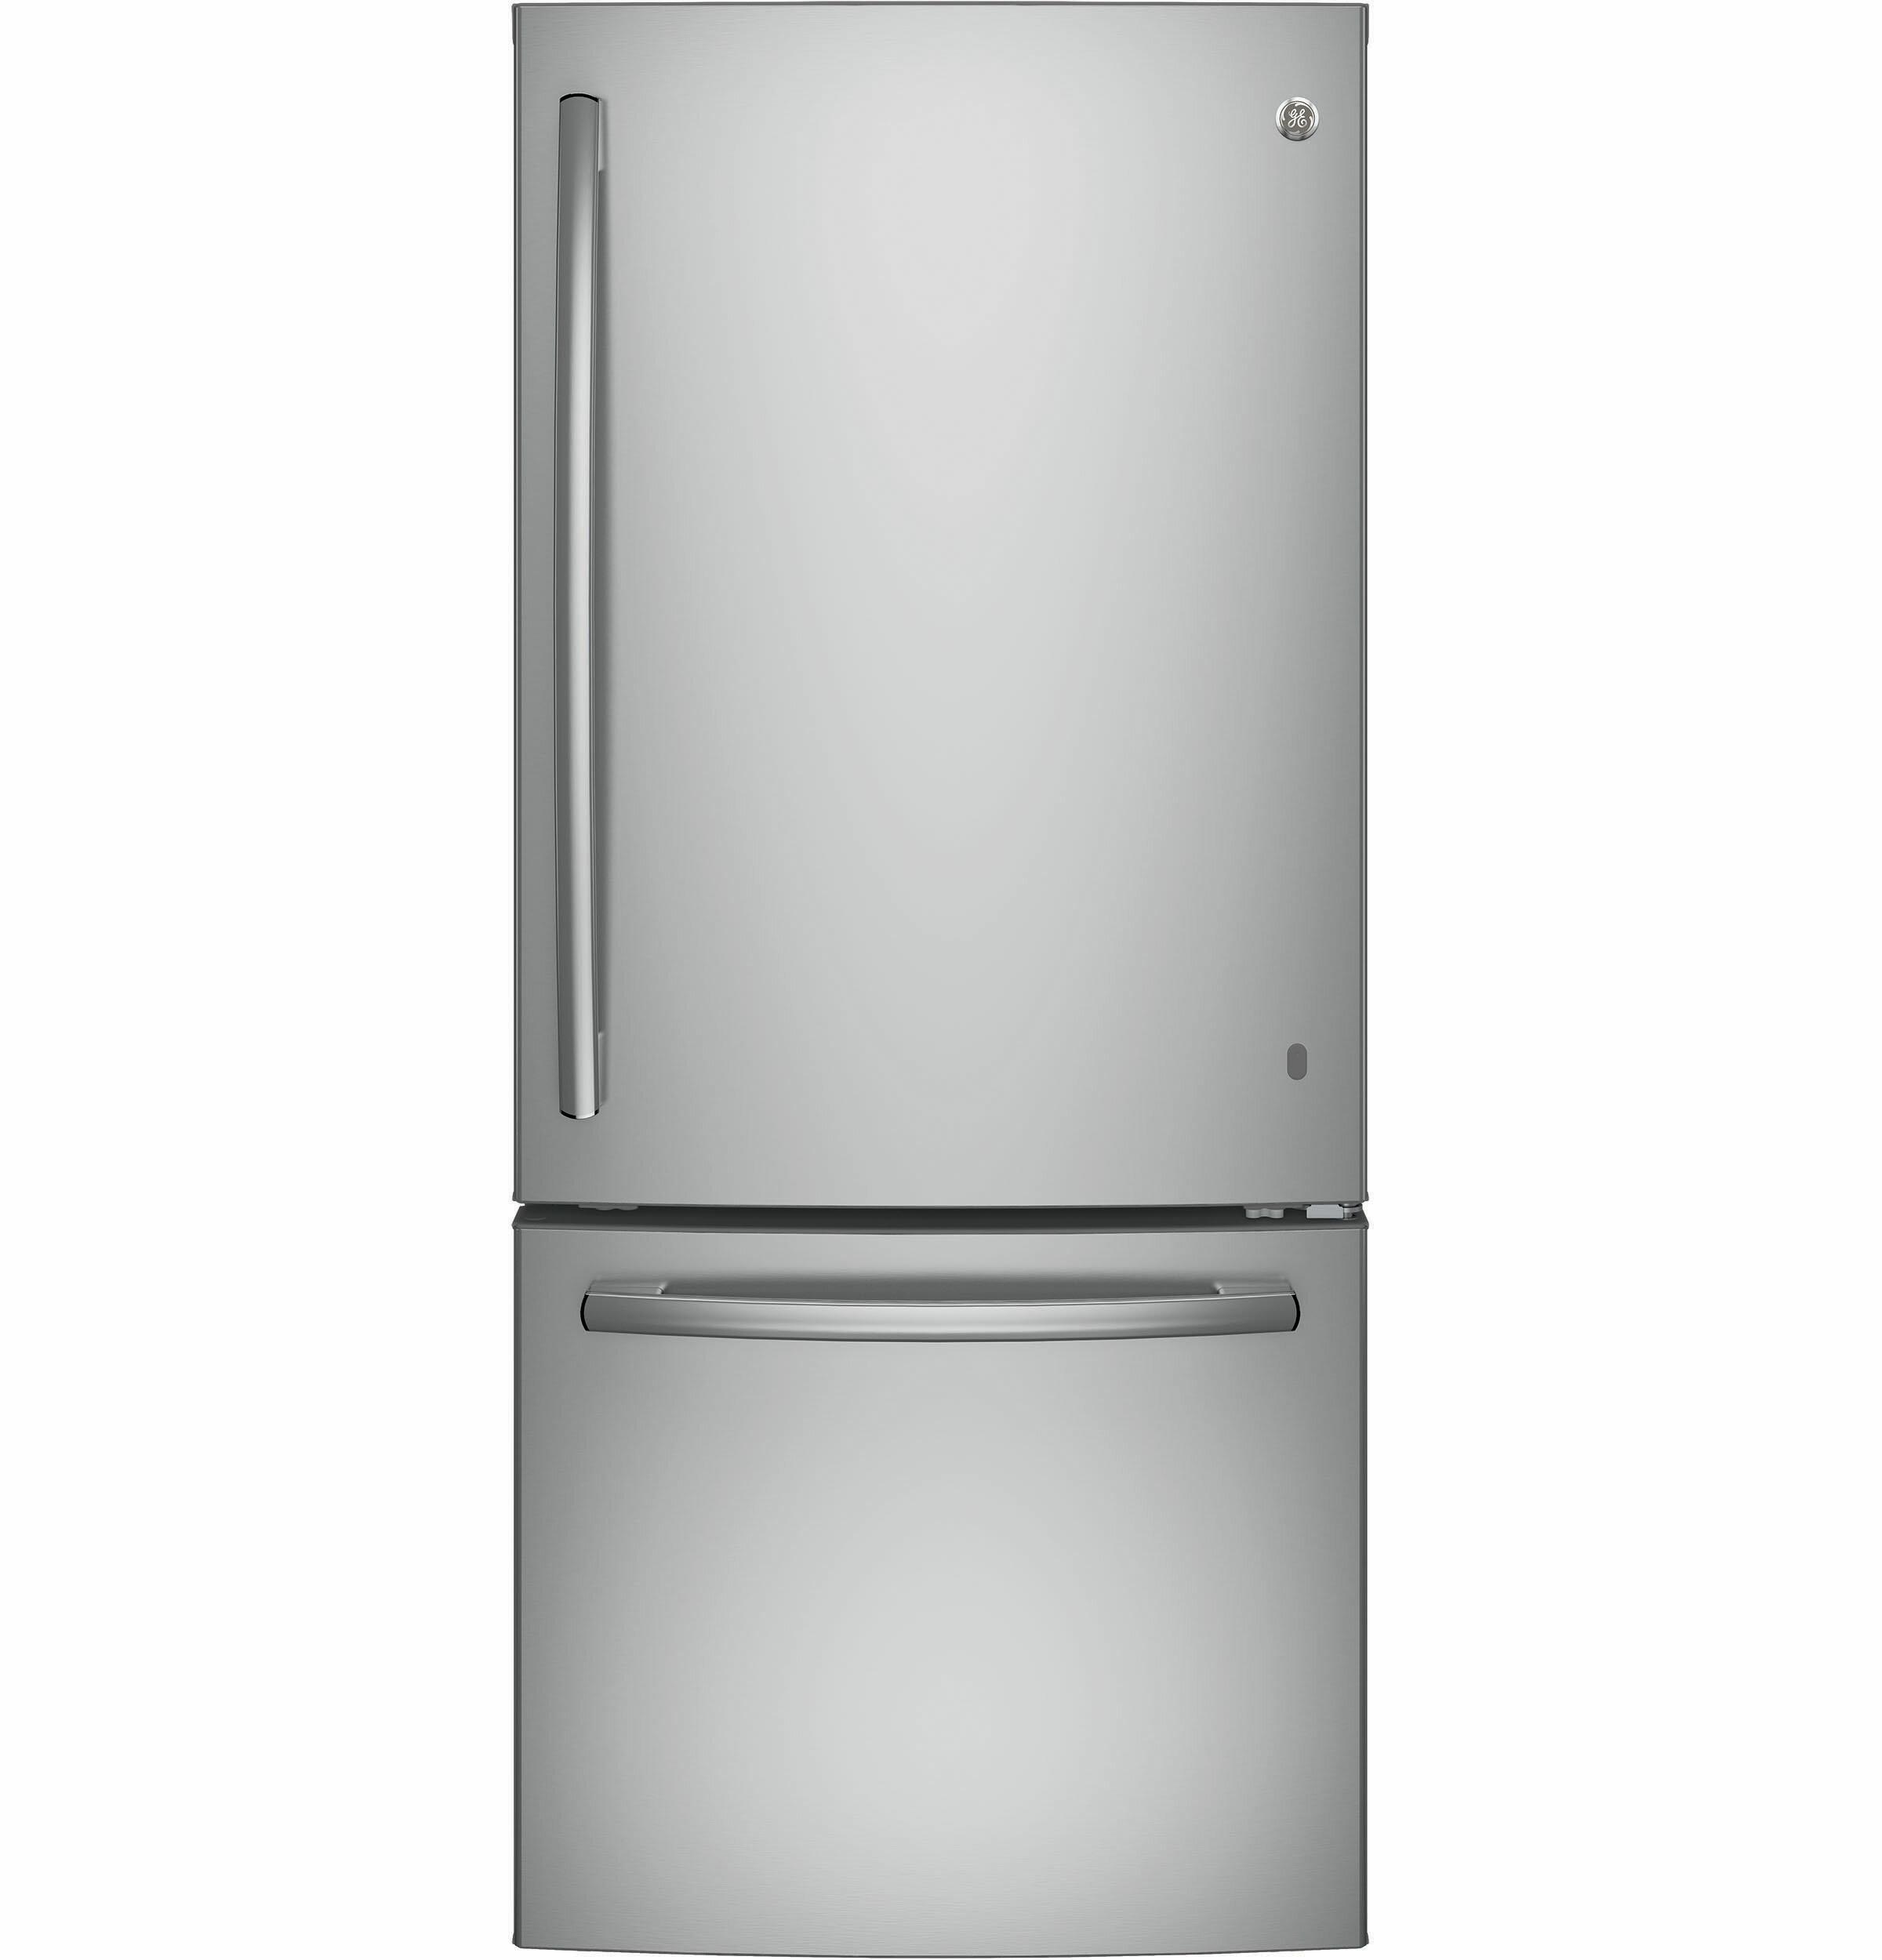 <br/><br/>  【零利率】GE 美國奇異   (不銹鋼)下冷凍冰箱 GBE21DSSS  ※熱線07-7428010<br/><br/>